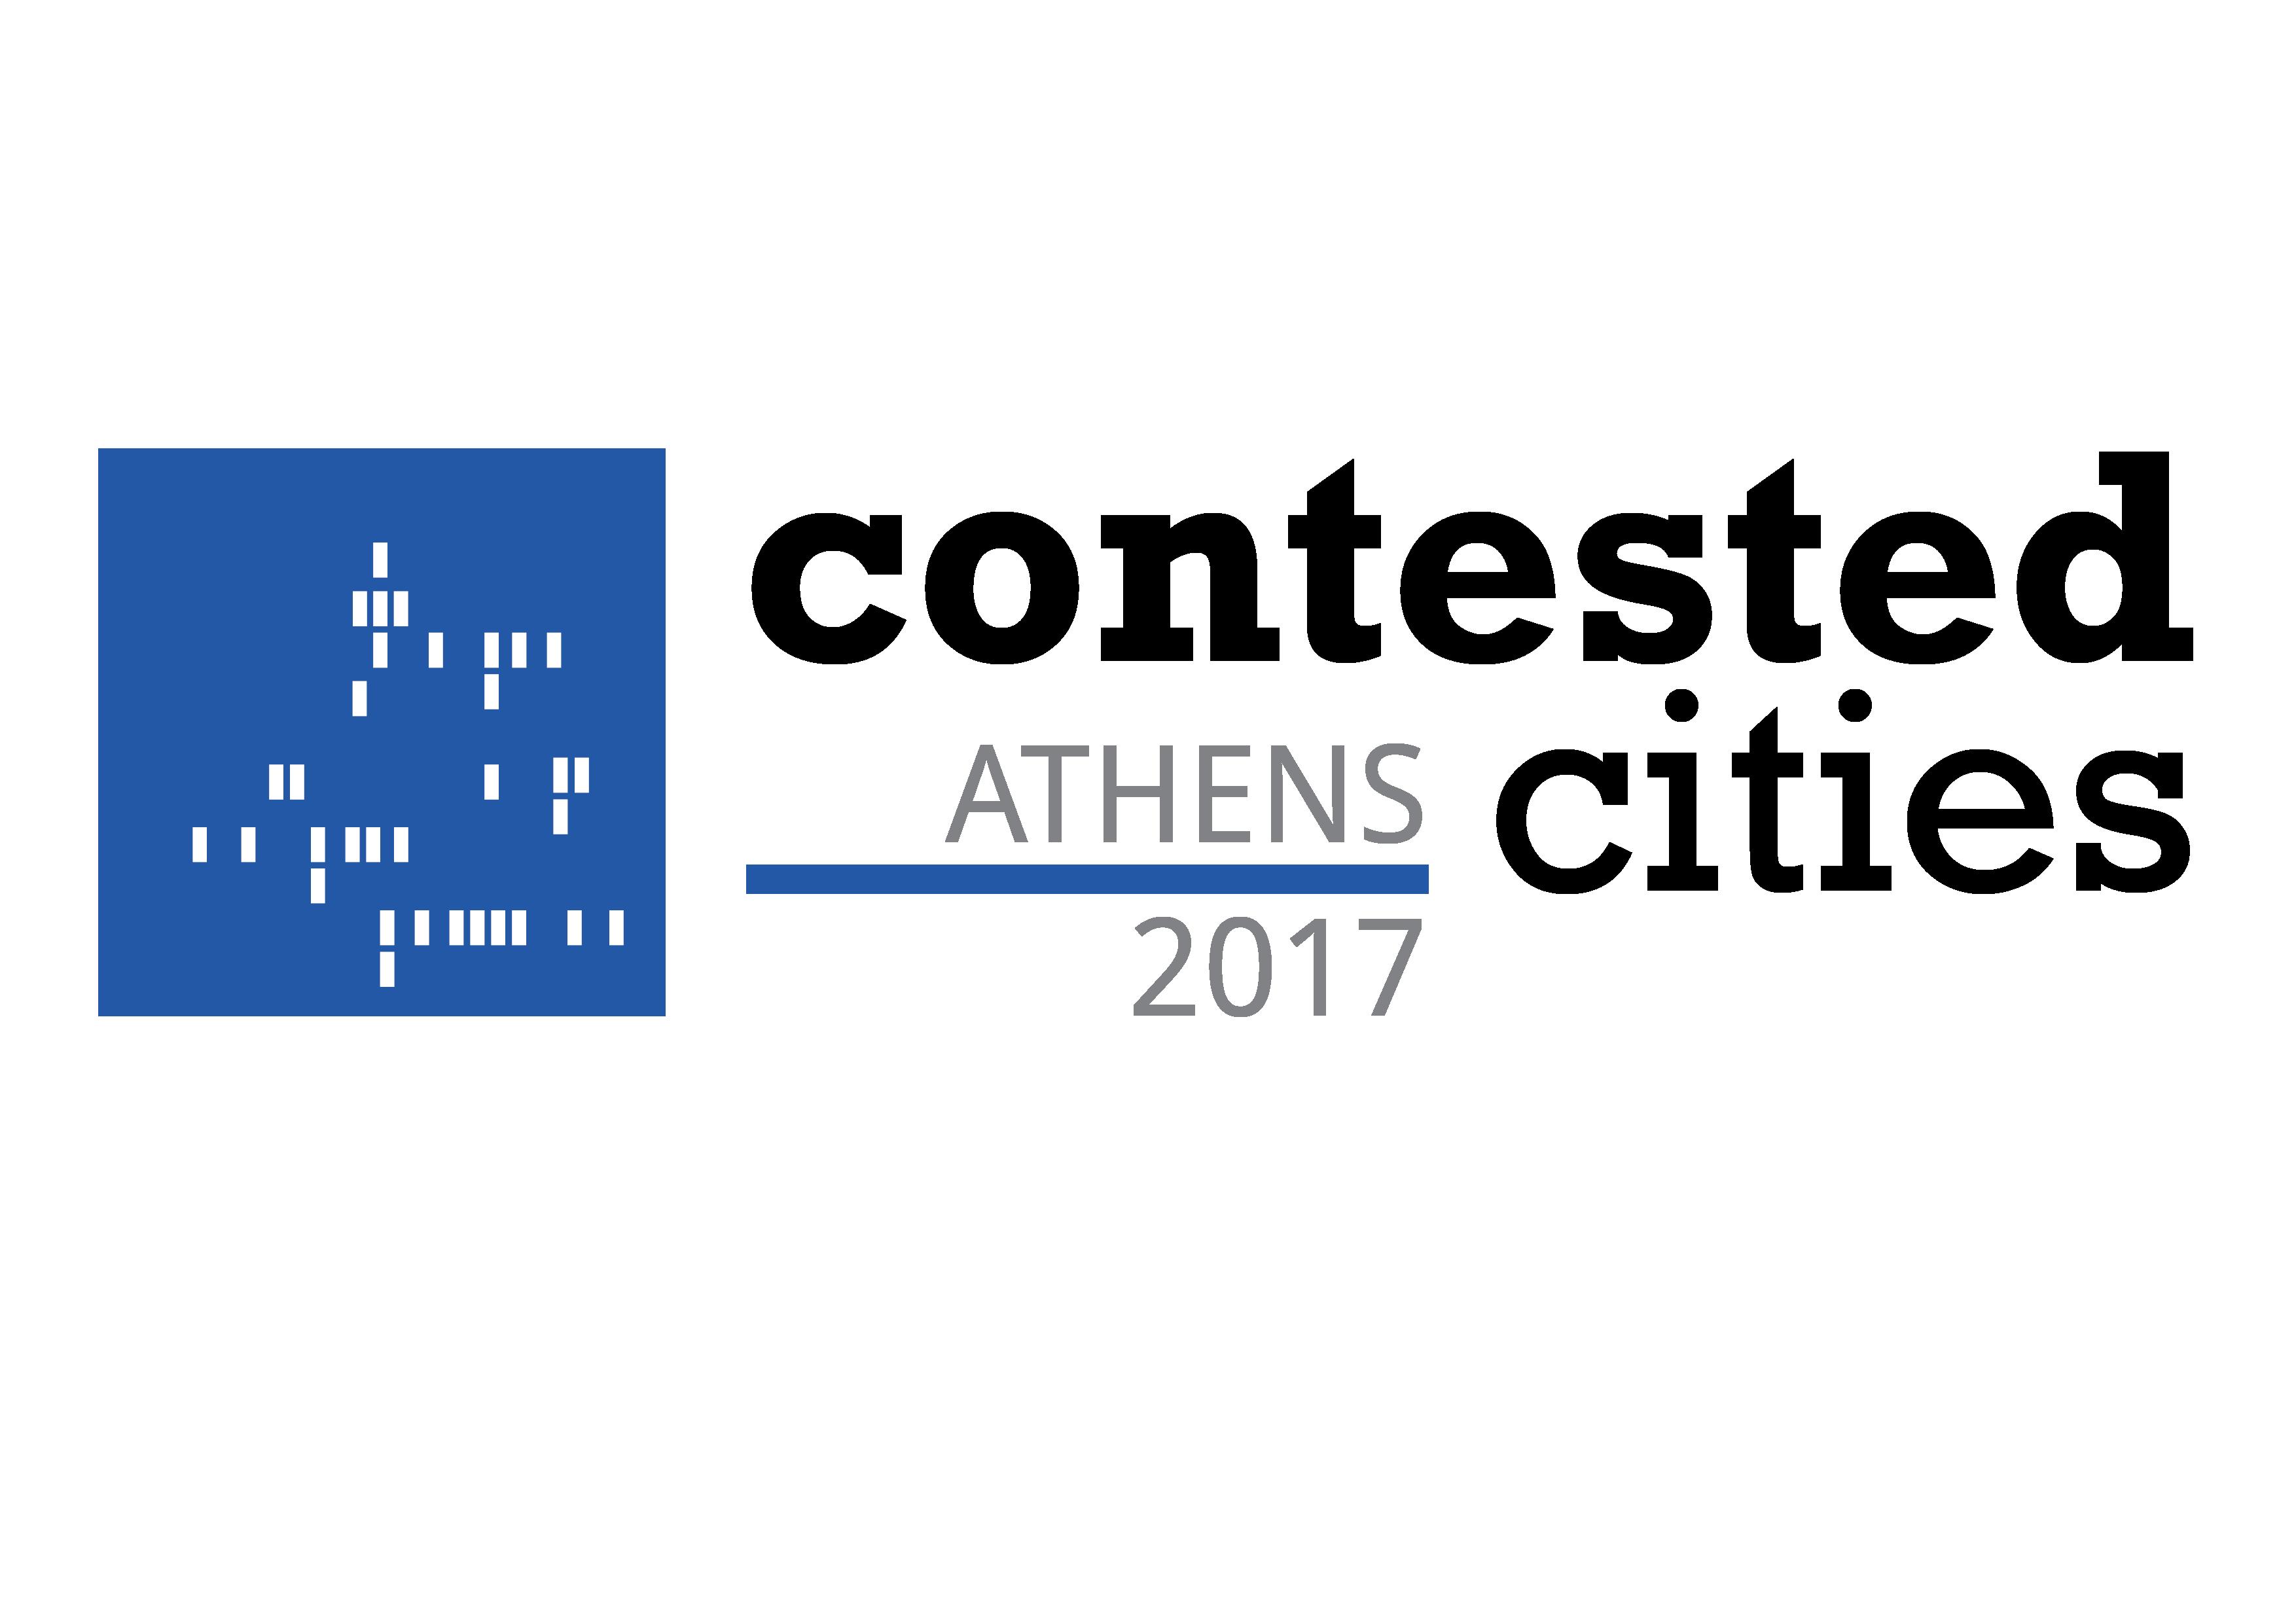 CC_Athens_2017-02b